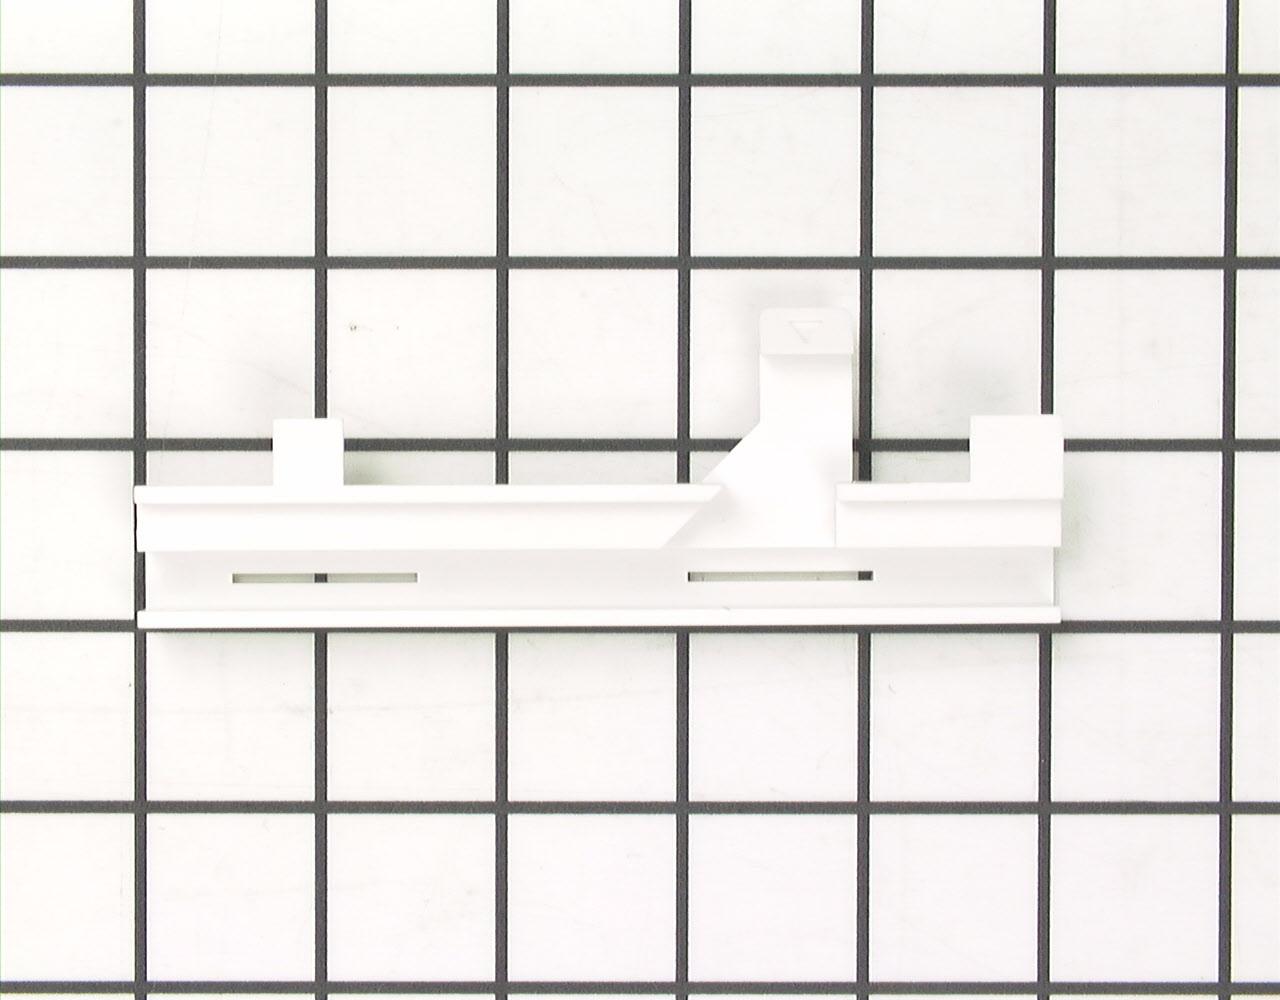 Whirlpool Refrigerator Part # D7859404 - Slide